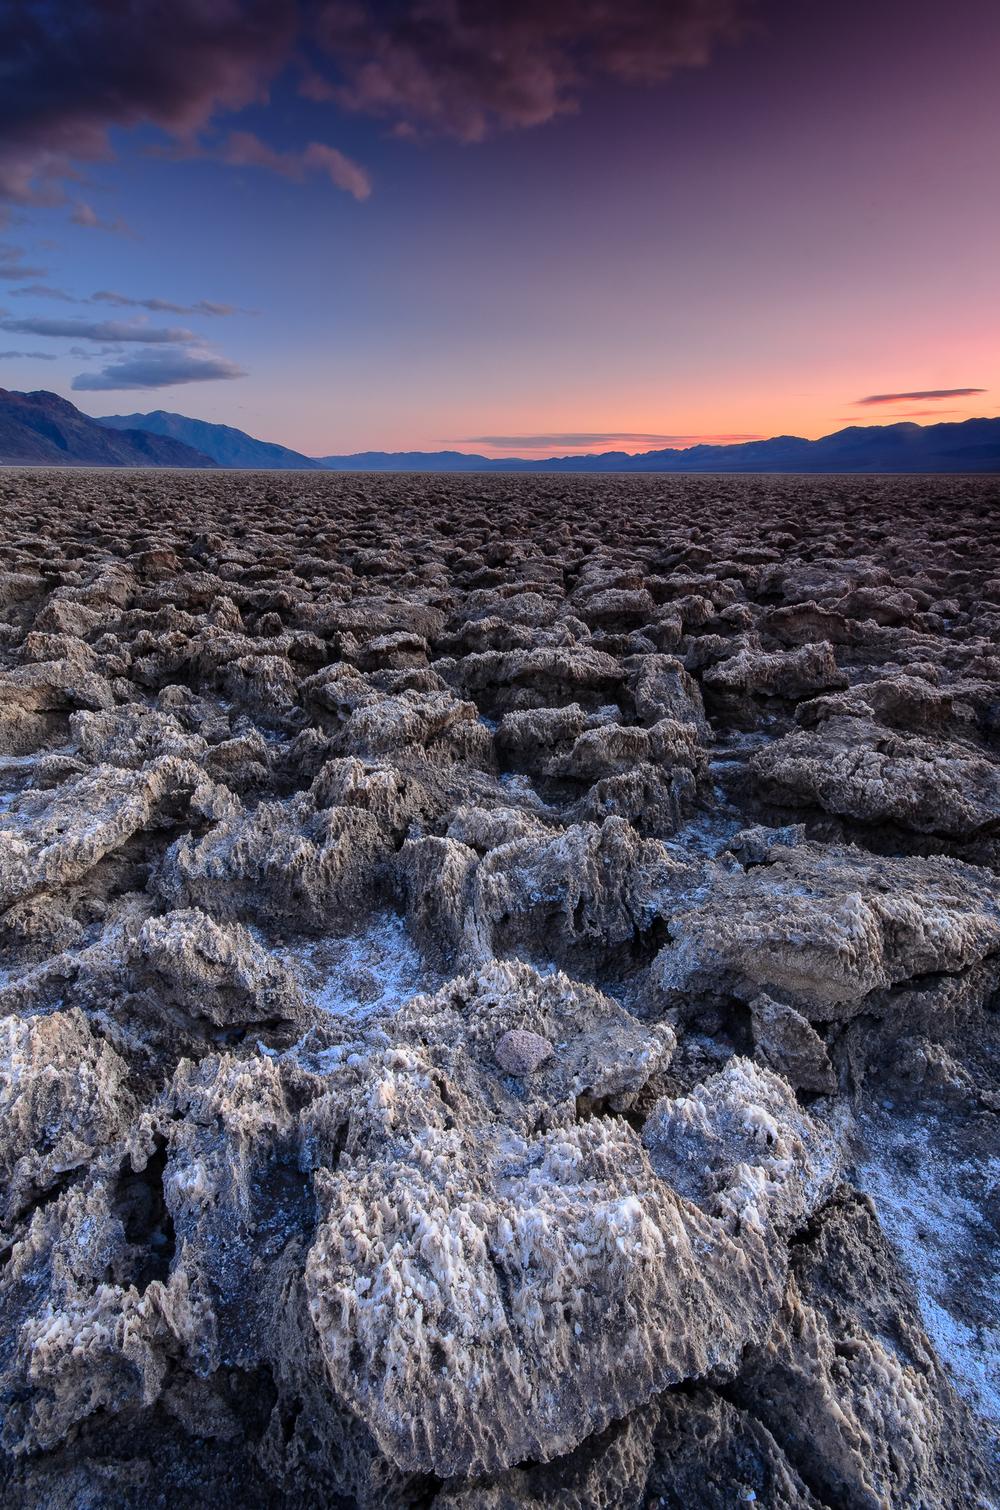 Jagged salt crystals warn xplorers to watch their step. Devil's Golf Course, Death Valley CA